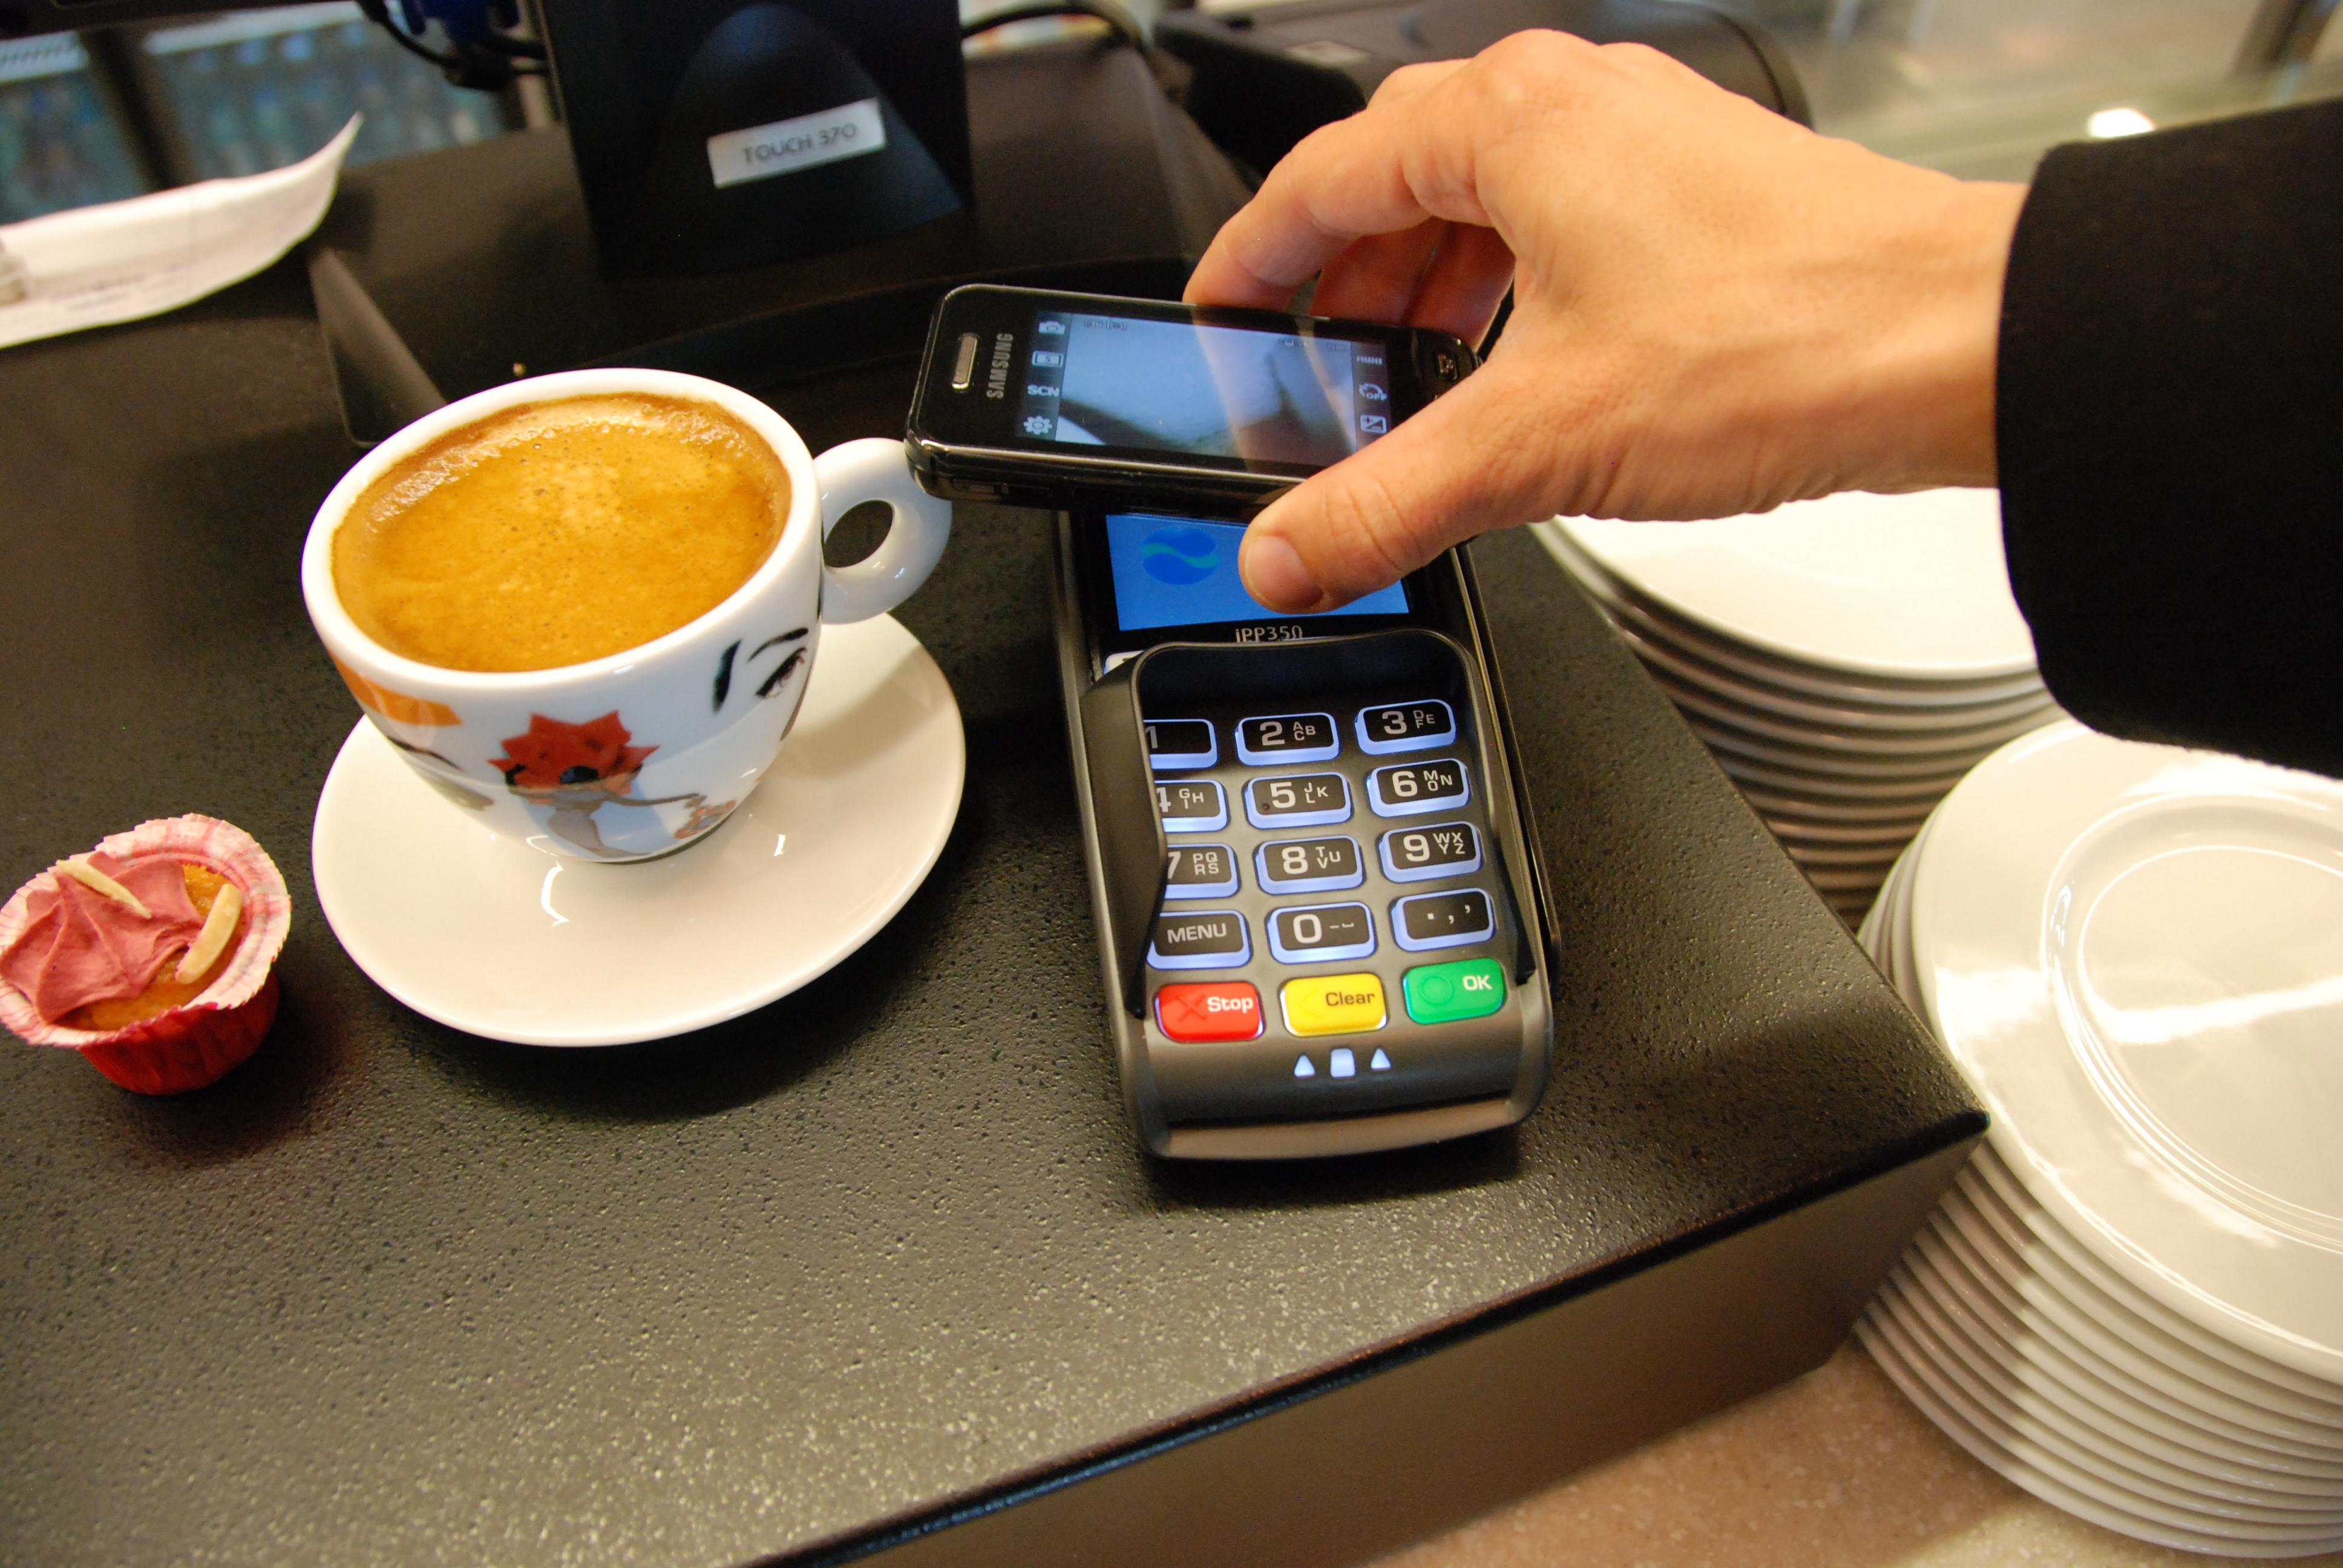 https://www.dotmug.net/wp-content/uploads/2016/07/Mobile_payment_03.jpg